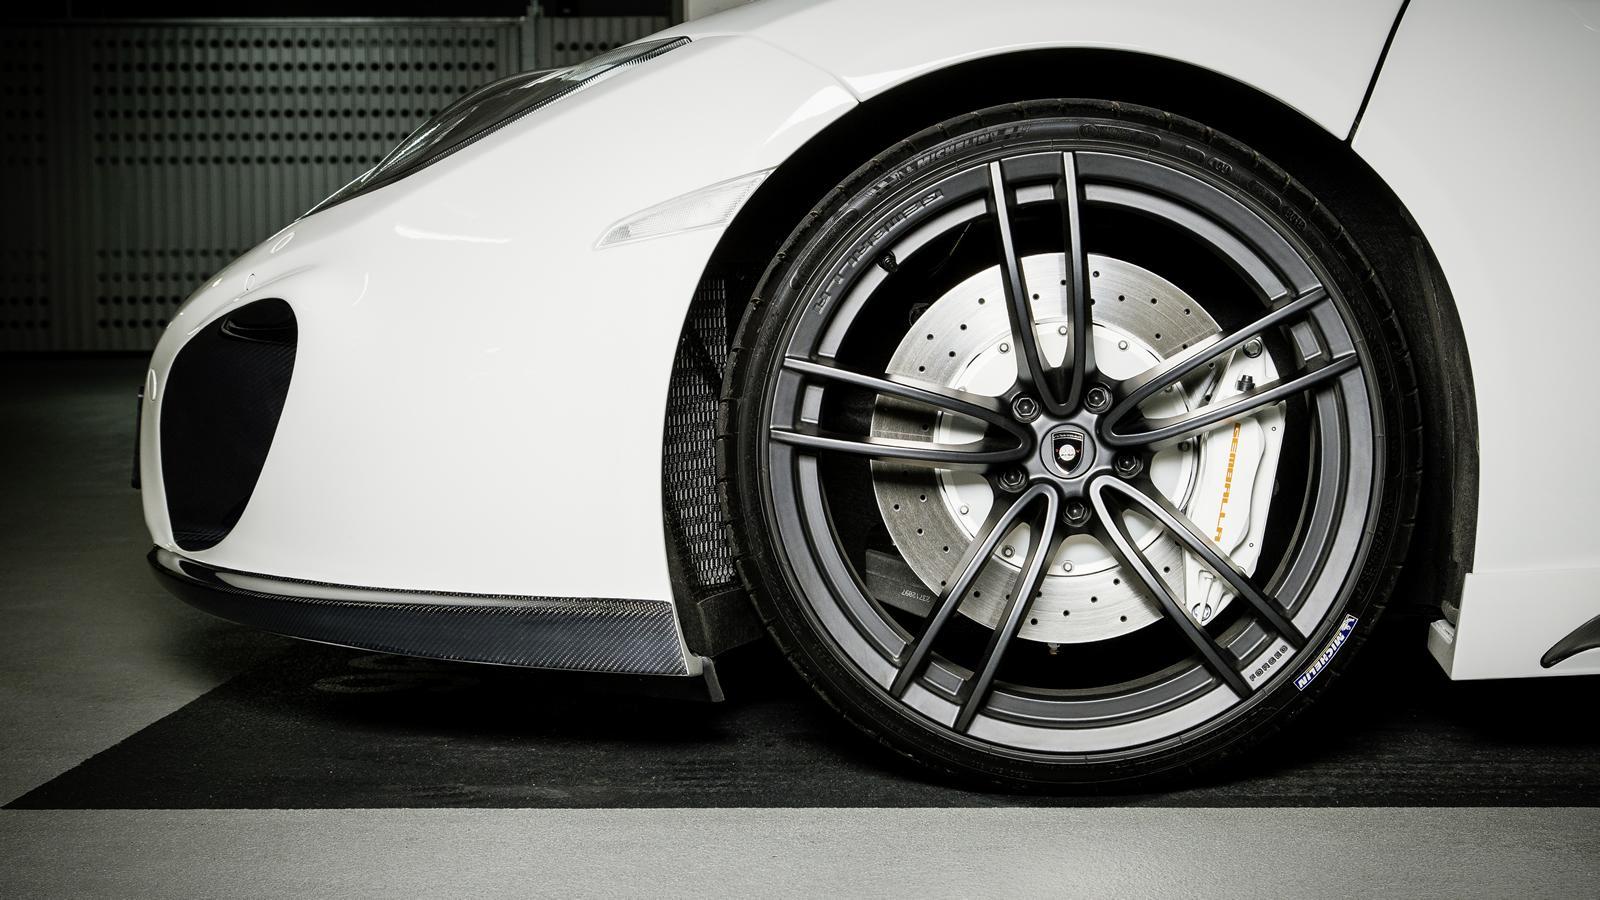 gemballa mclaren mp4-12c spider styling kit announced | performancedrive